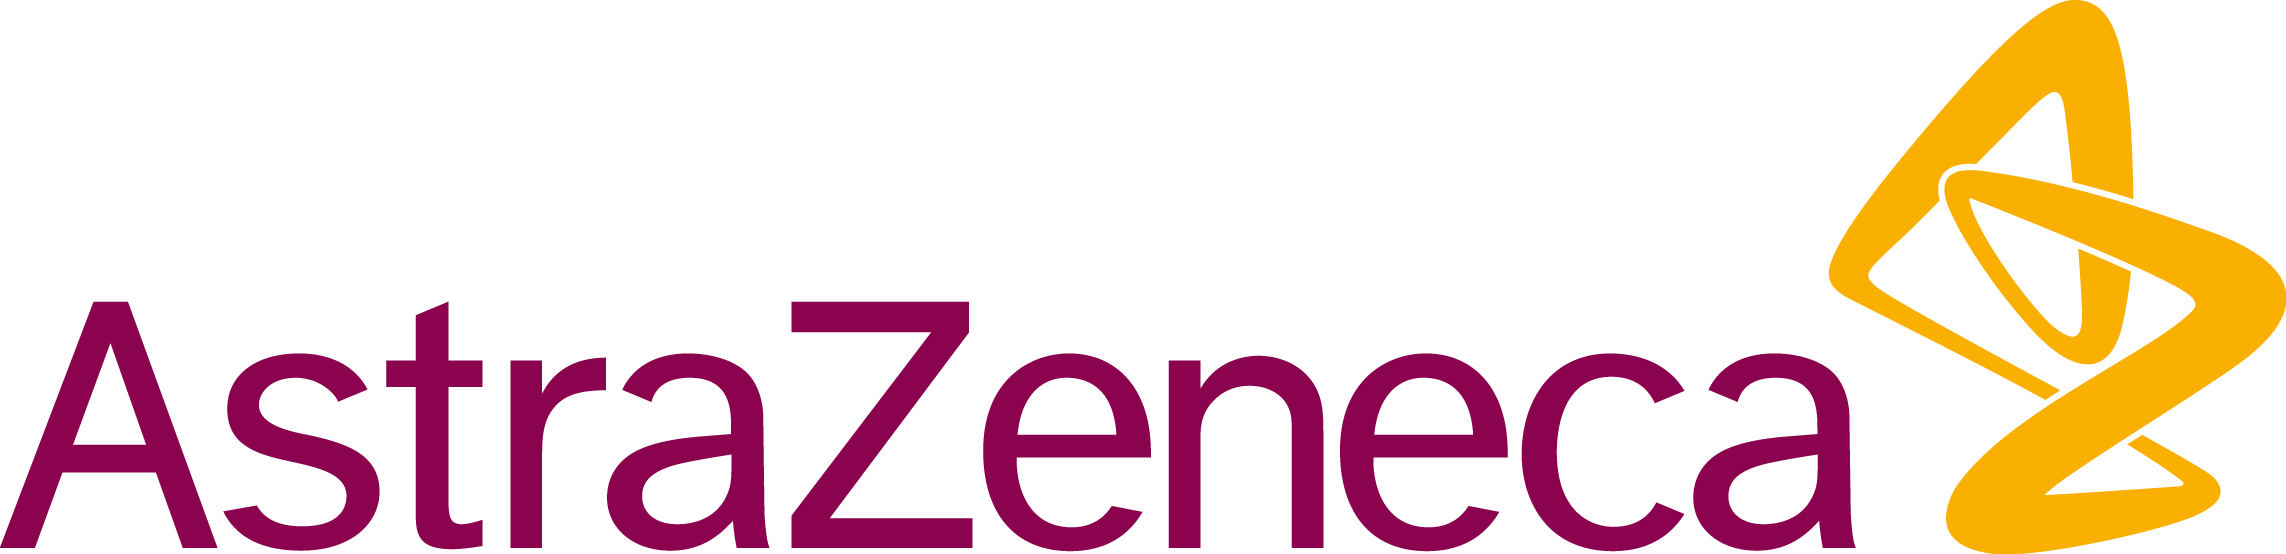 https://www.apexanalytix.com/sites/default/files/revslider/image/astrazeneca-logo-png-astra-zeneca-logo-astrazeneca-2286.png